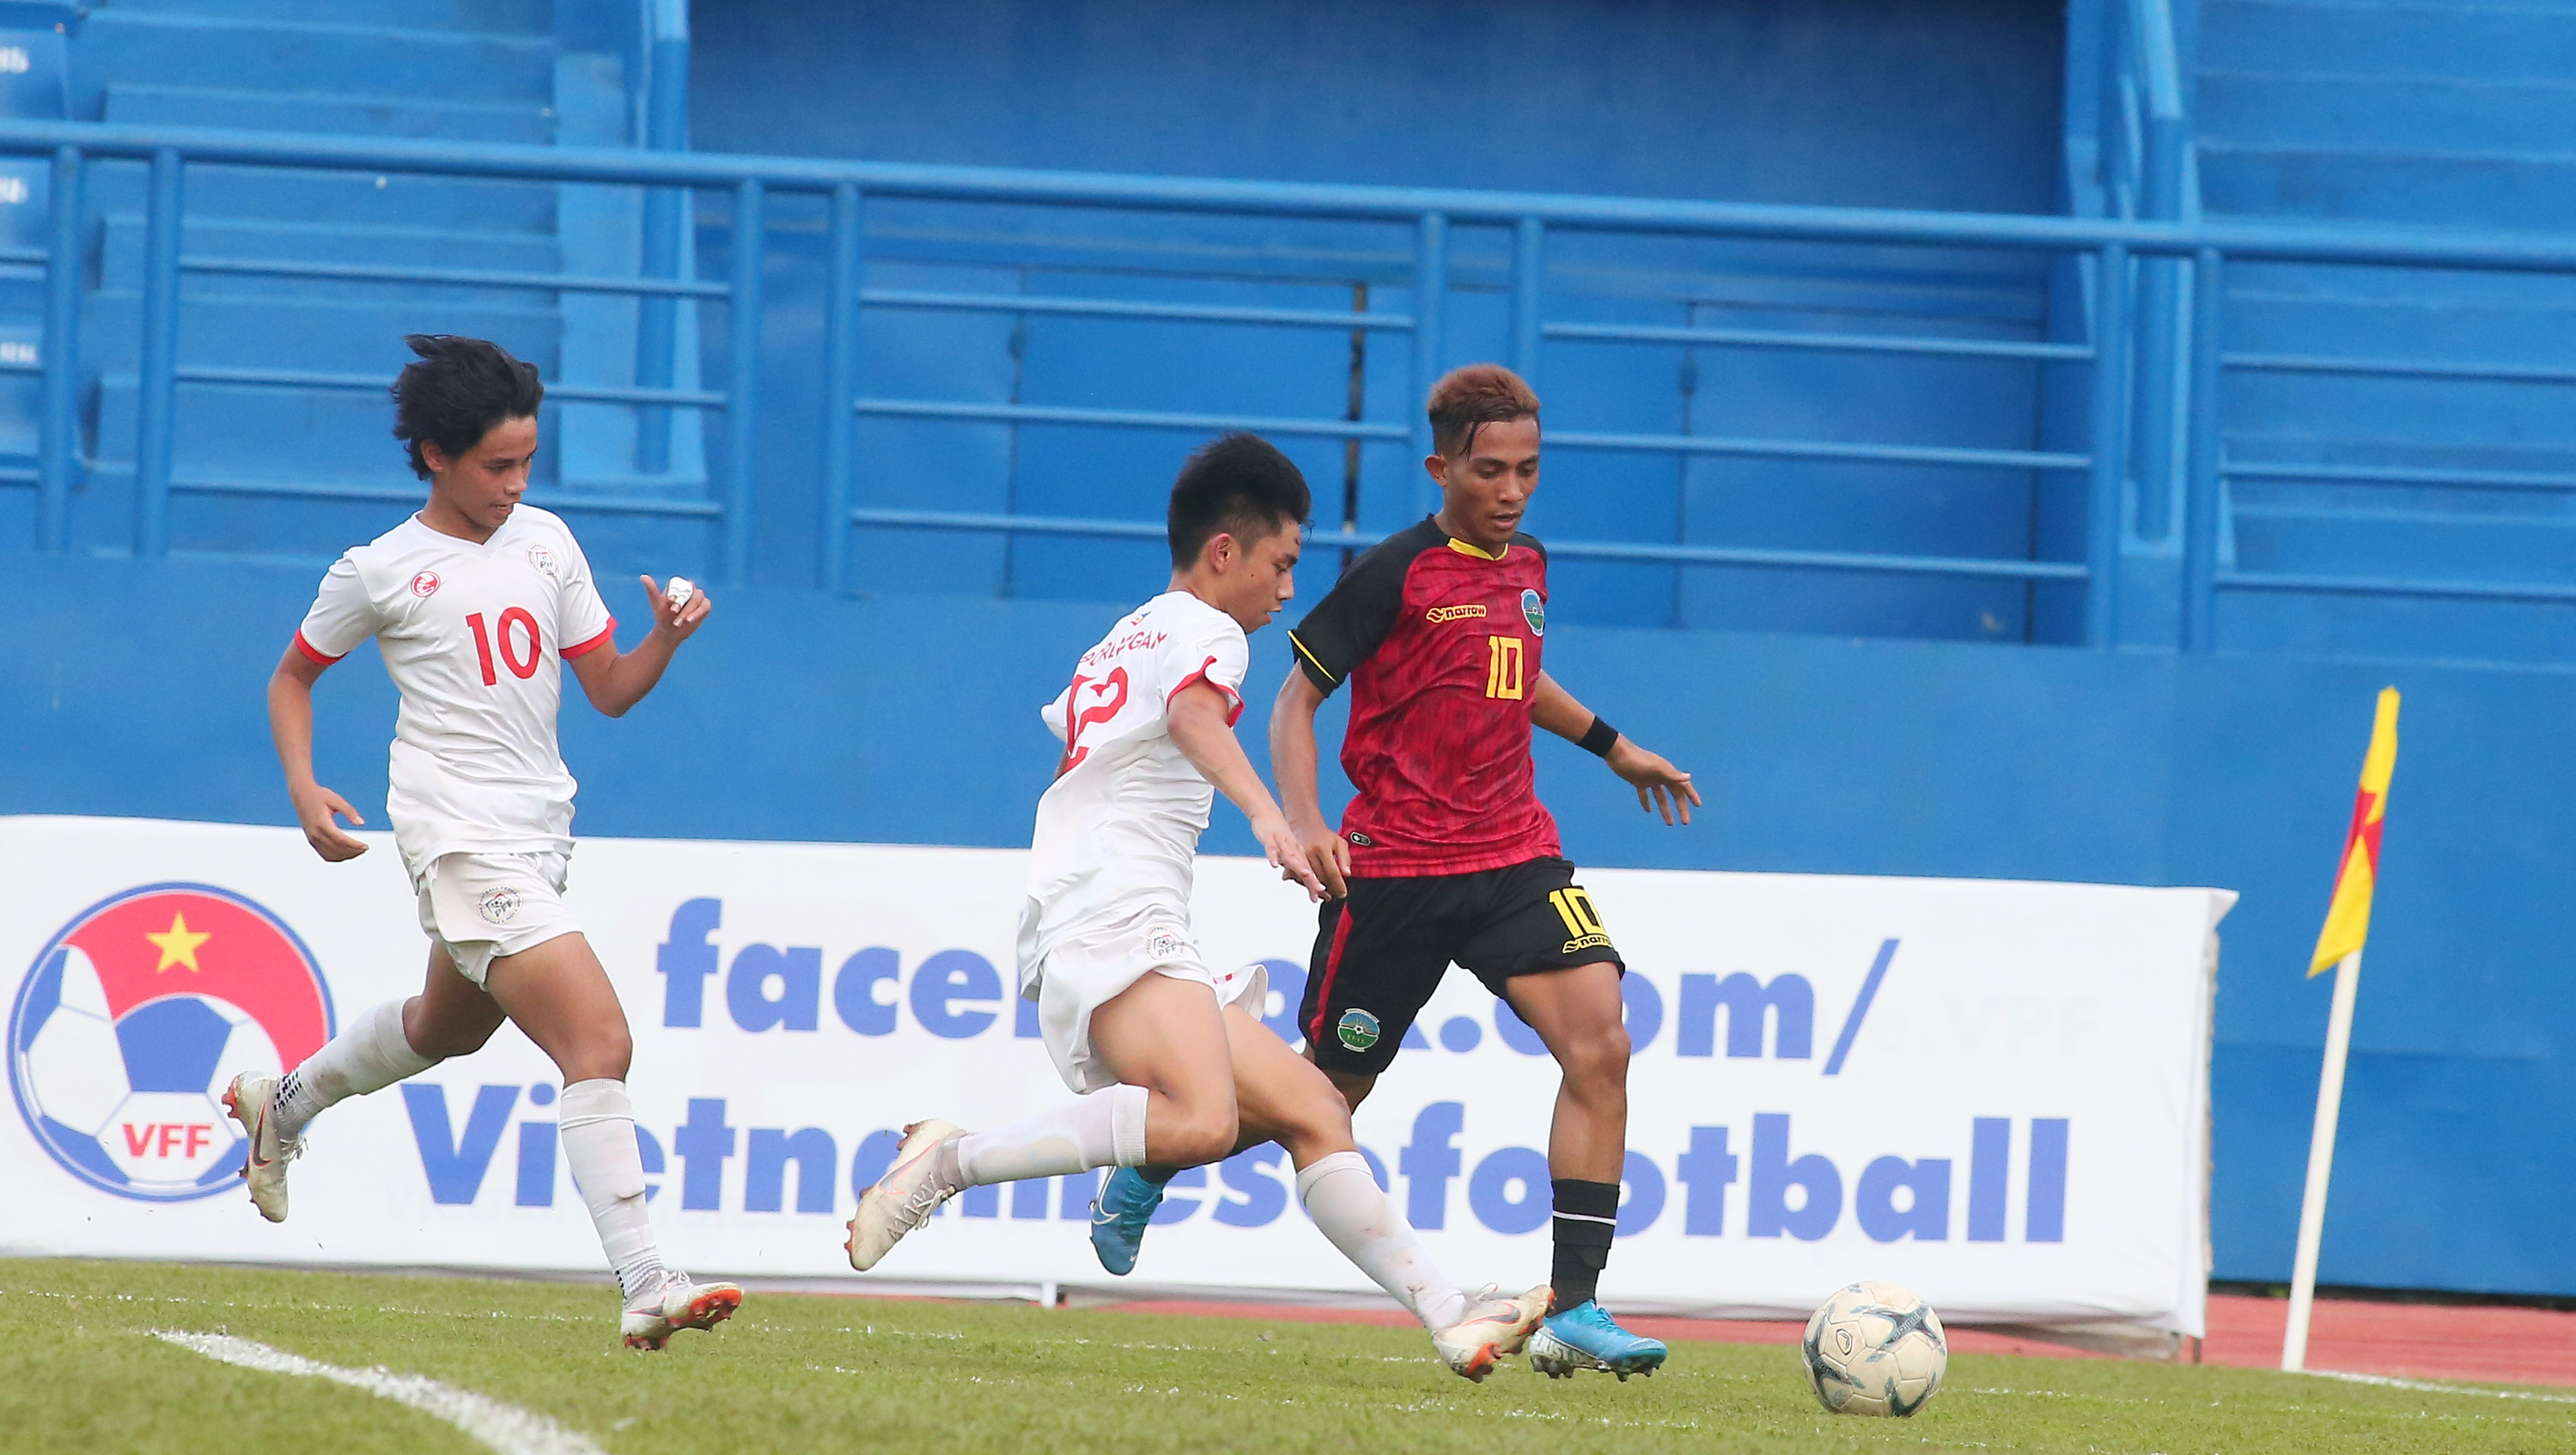 Thắng U18 Philippines 5-2, U18 Timor-Leste theo sát nhóm đầu